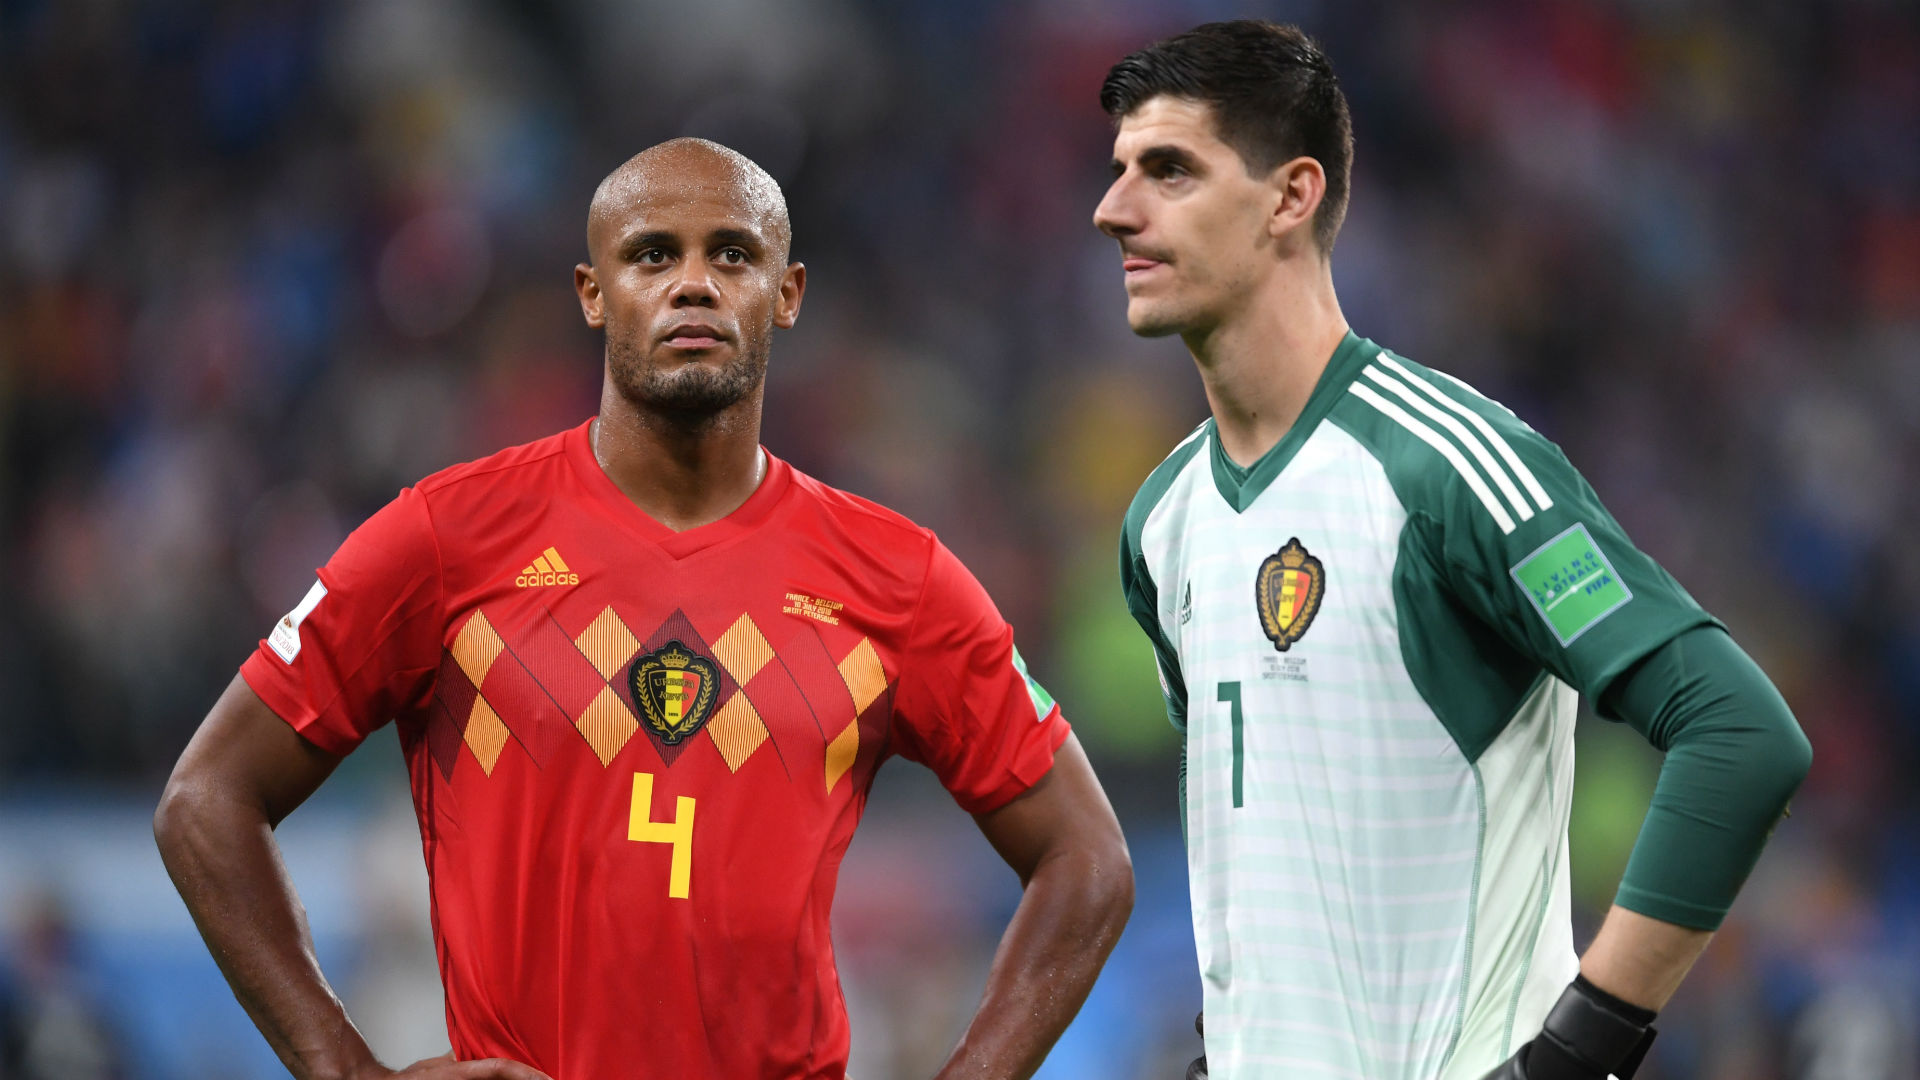 Vincent Kompany Thibaut Courtois Belgium World Cup 2018